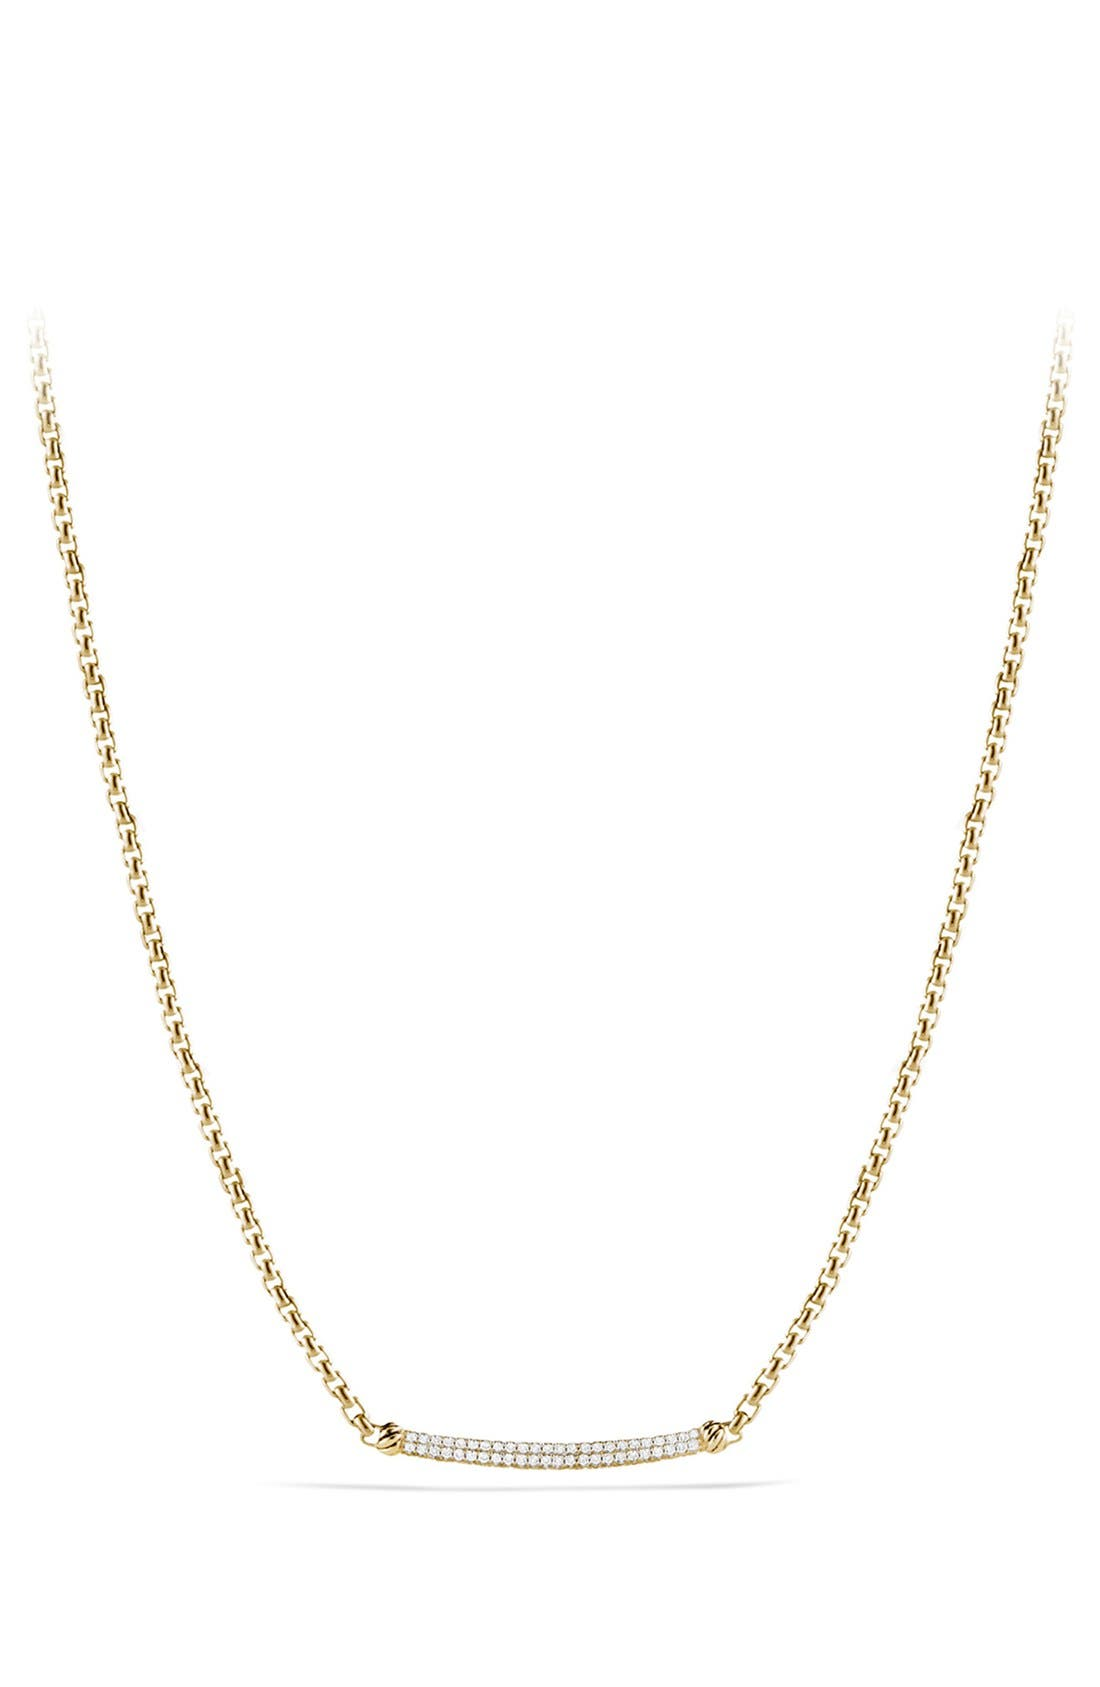 Main Image - David Yurman 'Petite Pavé' Metro Chain Necklace with Diamonds in Gold